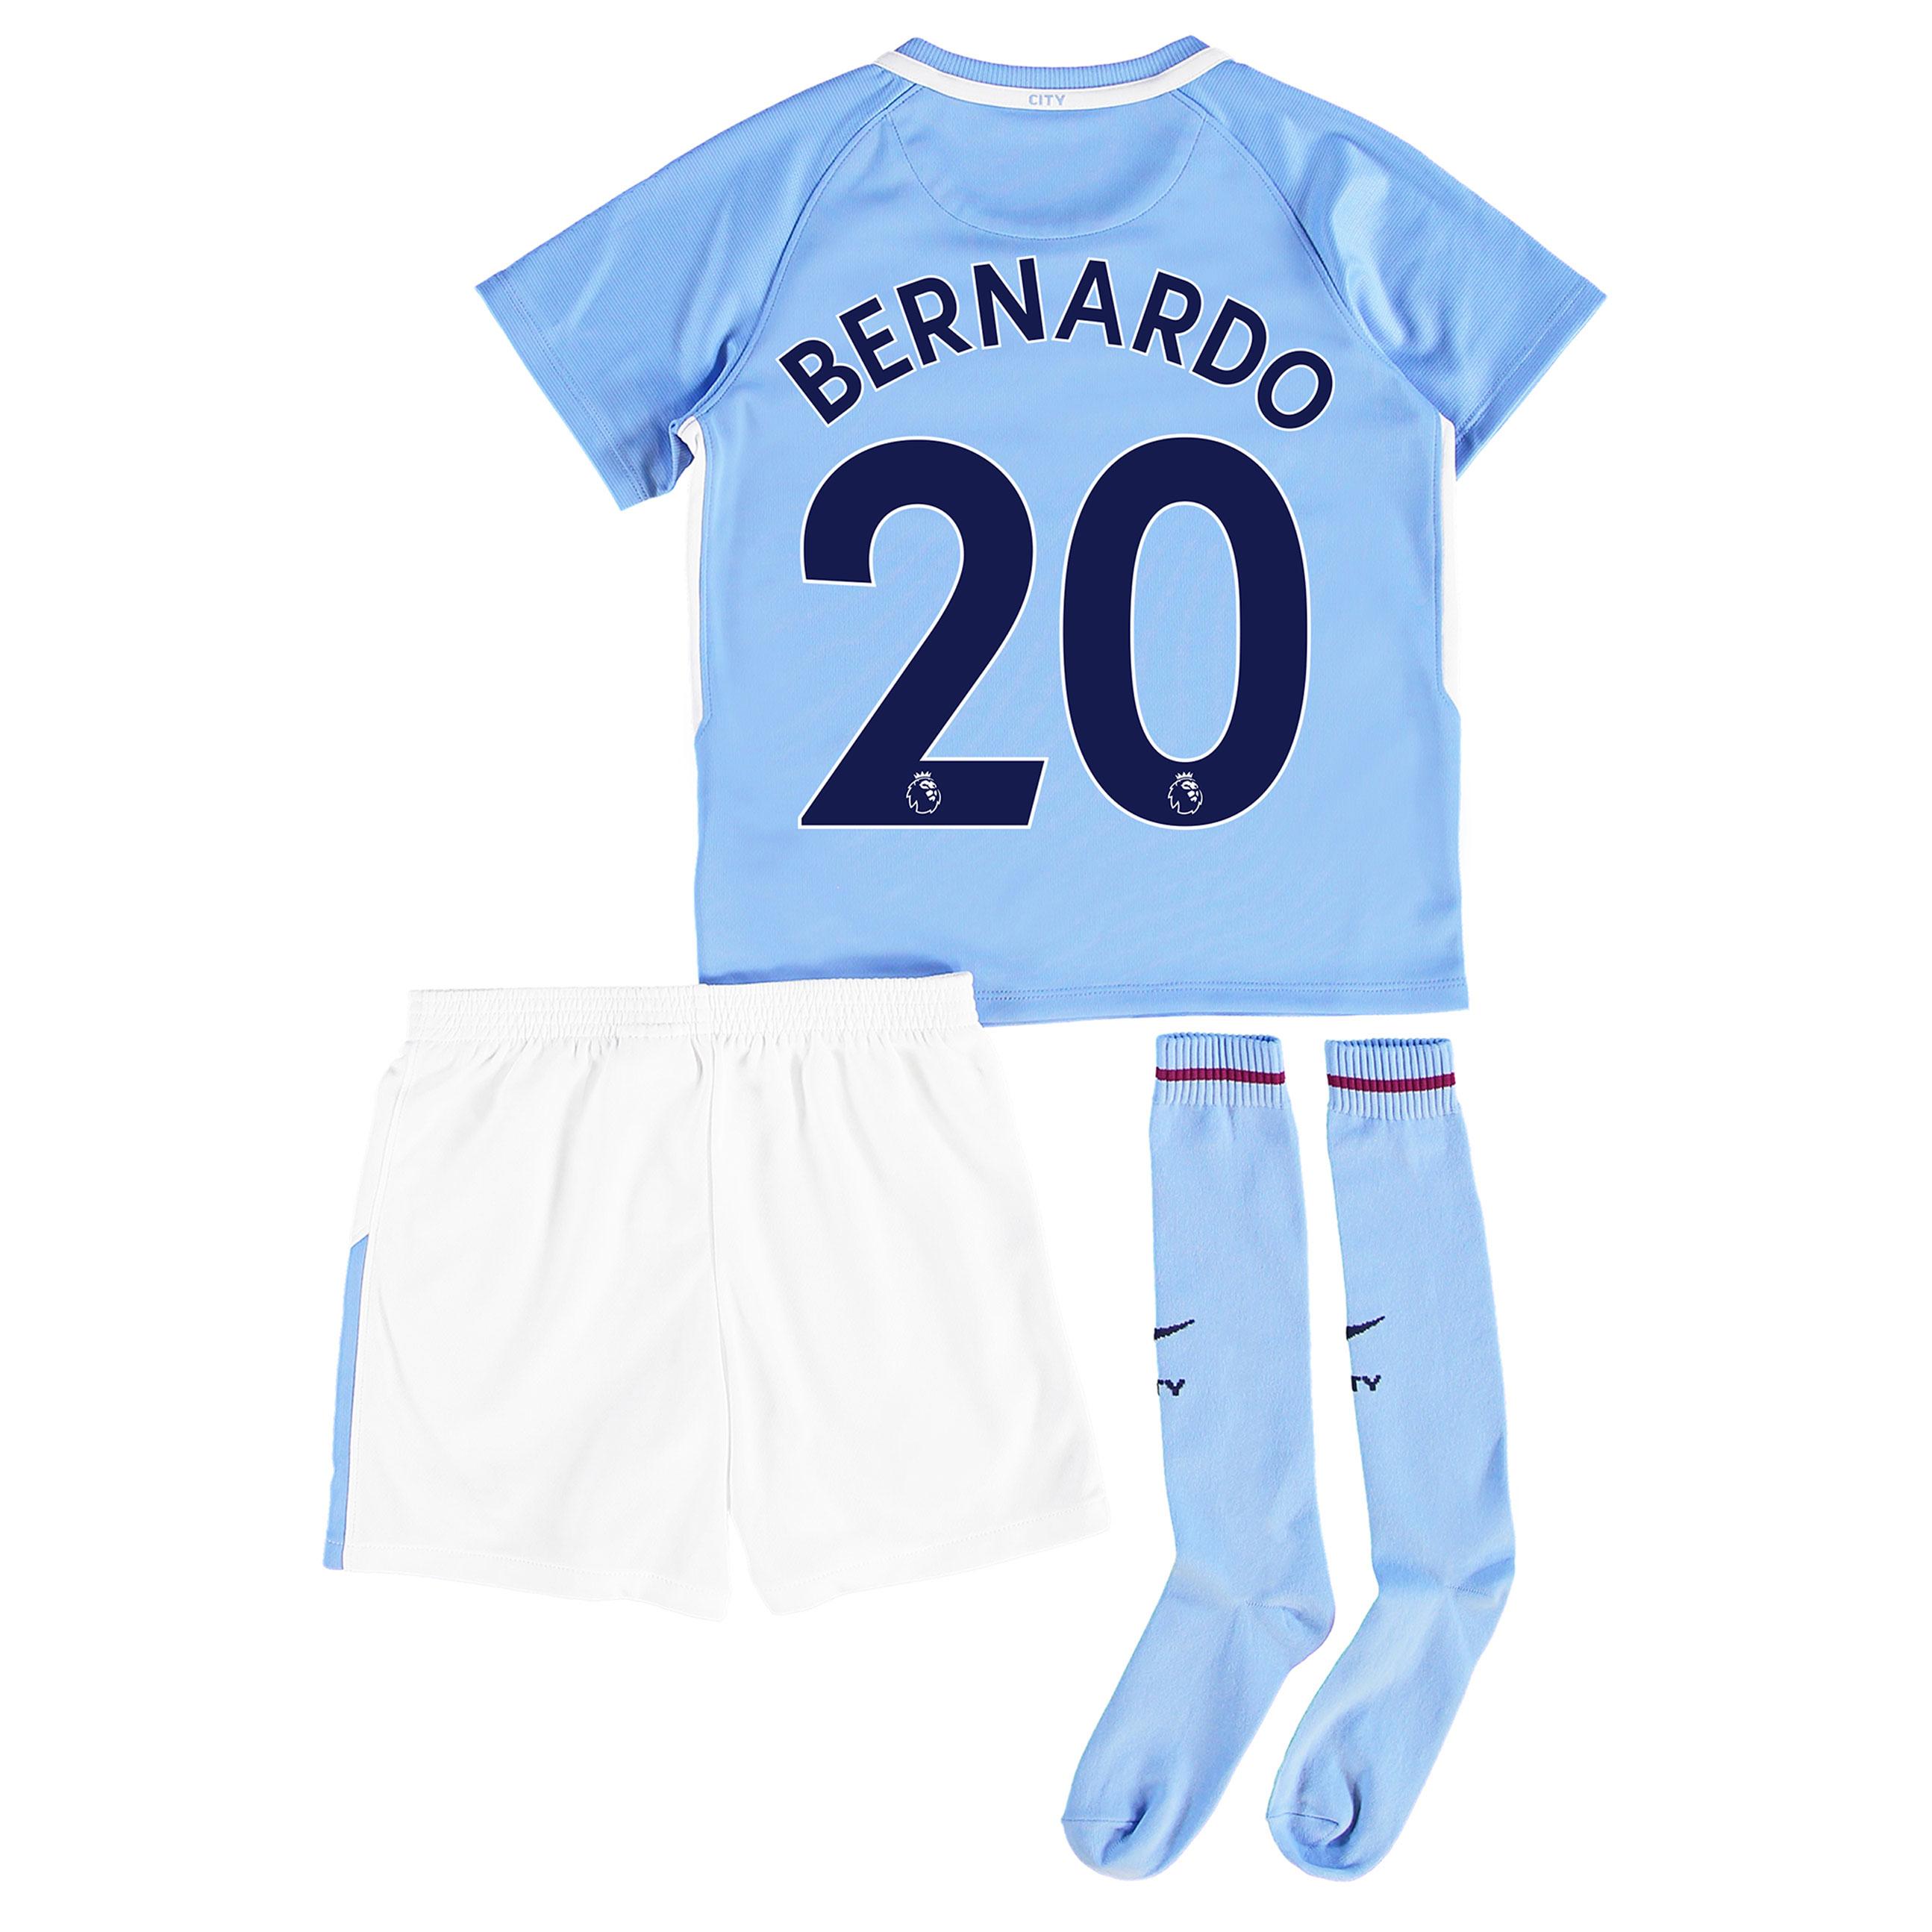 Manchester City Home Stadium Kit 2017-18 - Little Kids with Bernardo 2